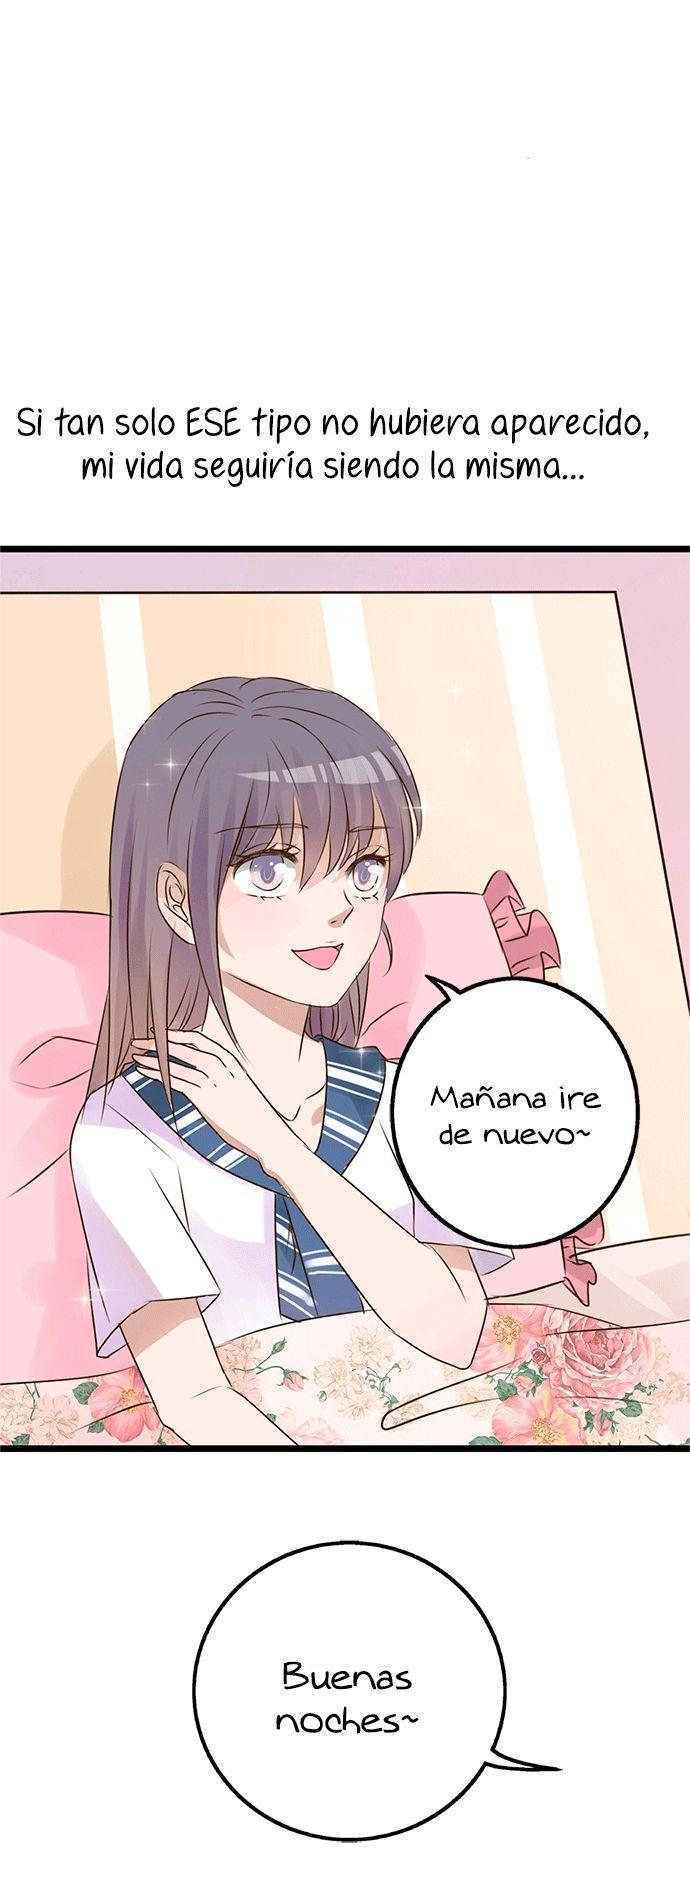 Milk Tea Capítulo 1 página 1 (Cargar imágenes: 10) - Leer Manga en Español gratis en NineManga.com